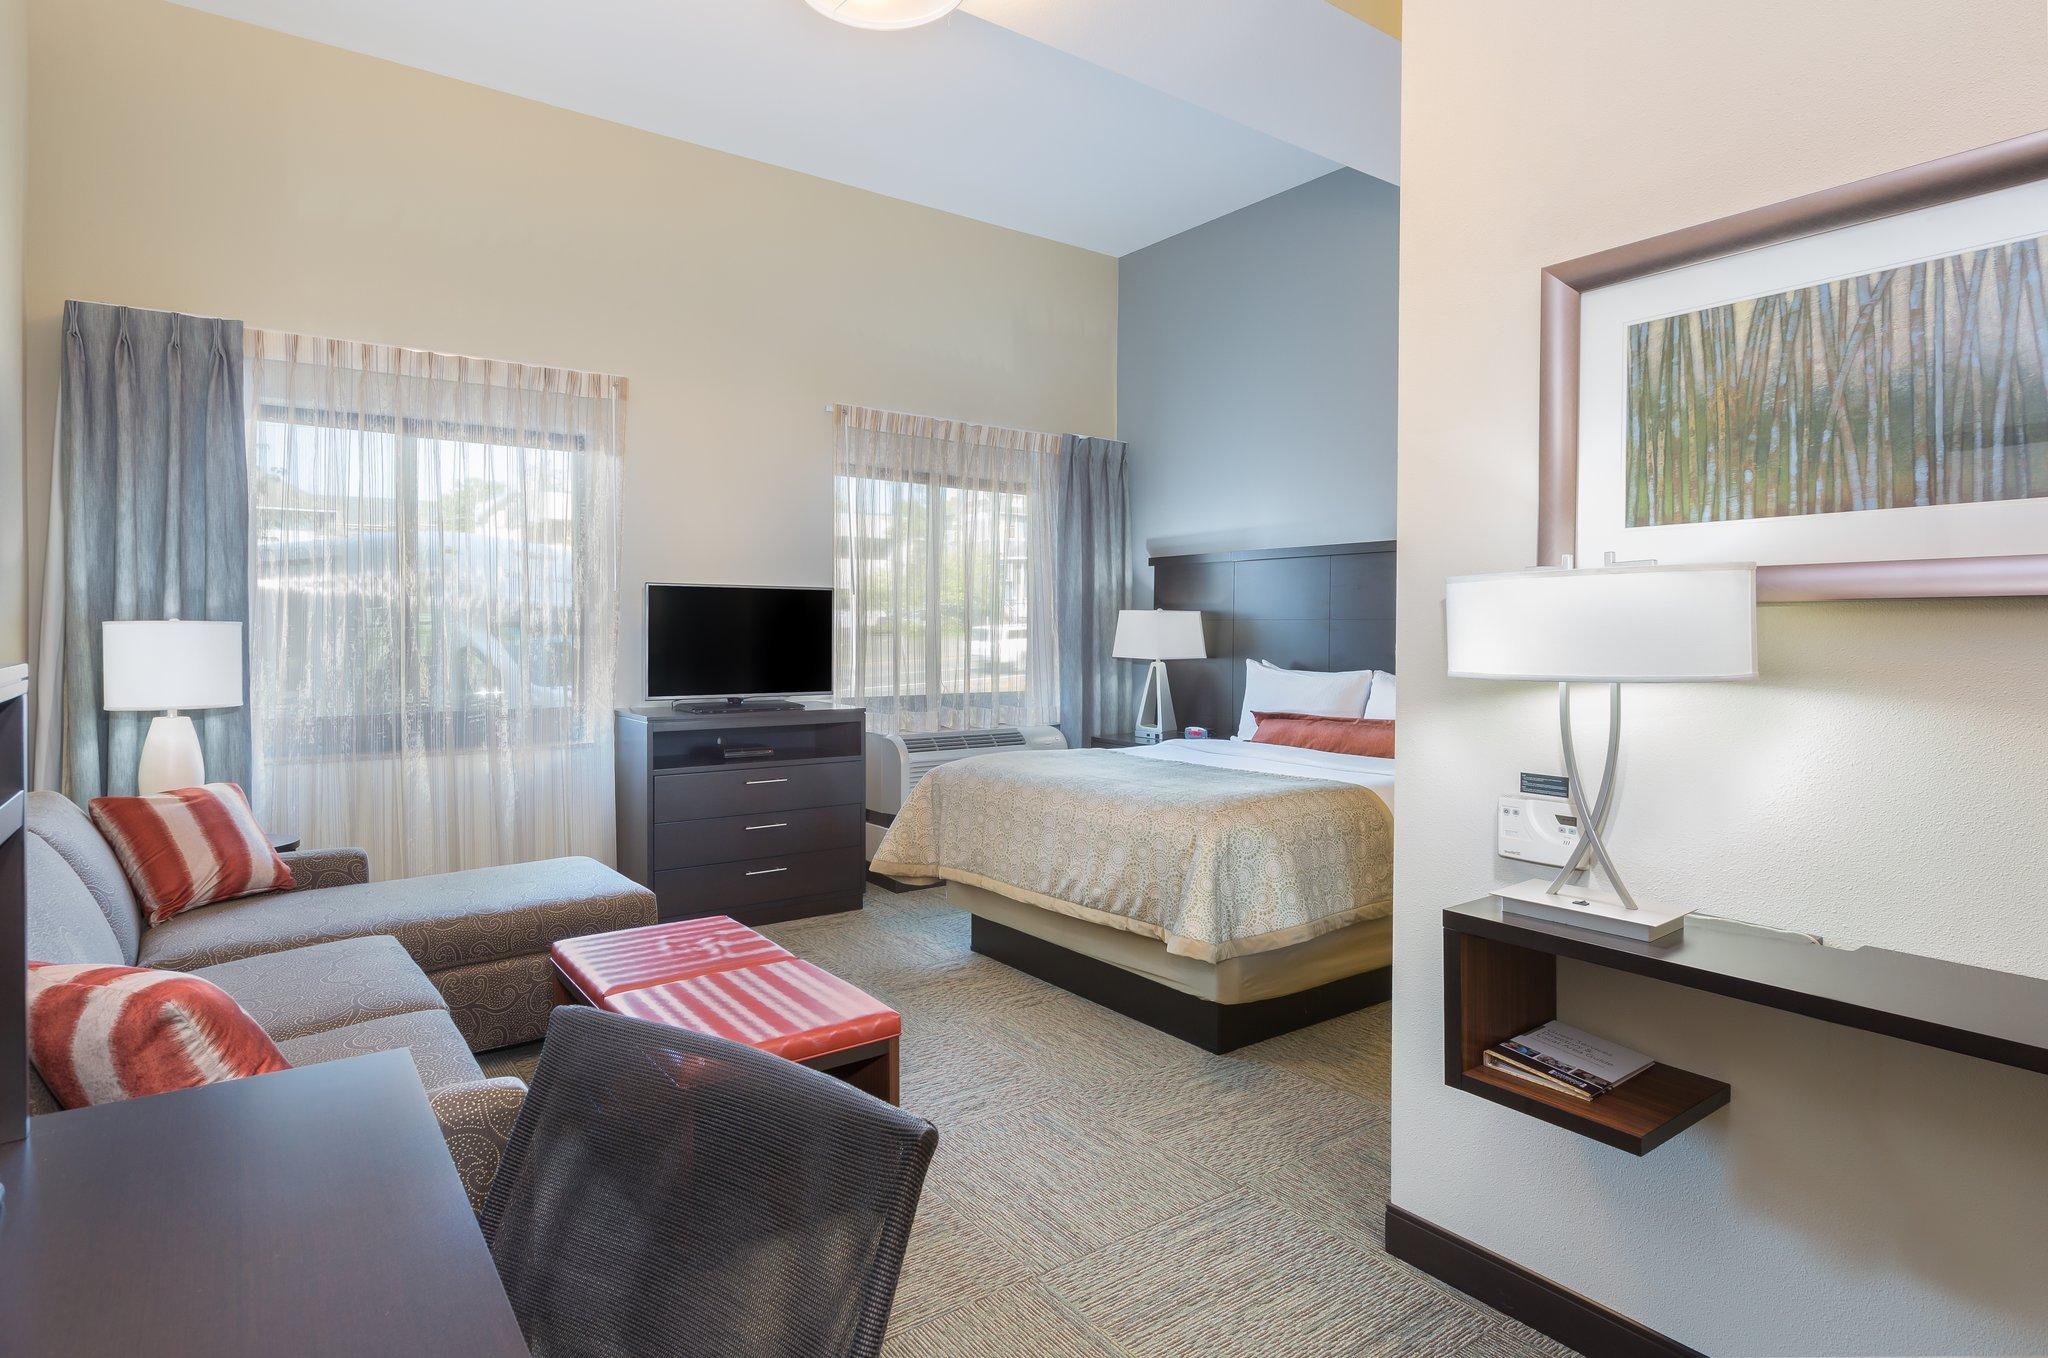 Seattle Hotel Suites 2 Bedrooms Staybridge Suites Seattle Fremont Updated 2017 Hotel Reviews